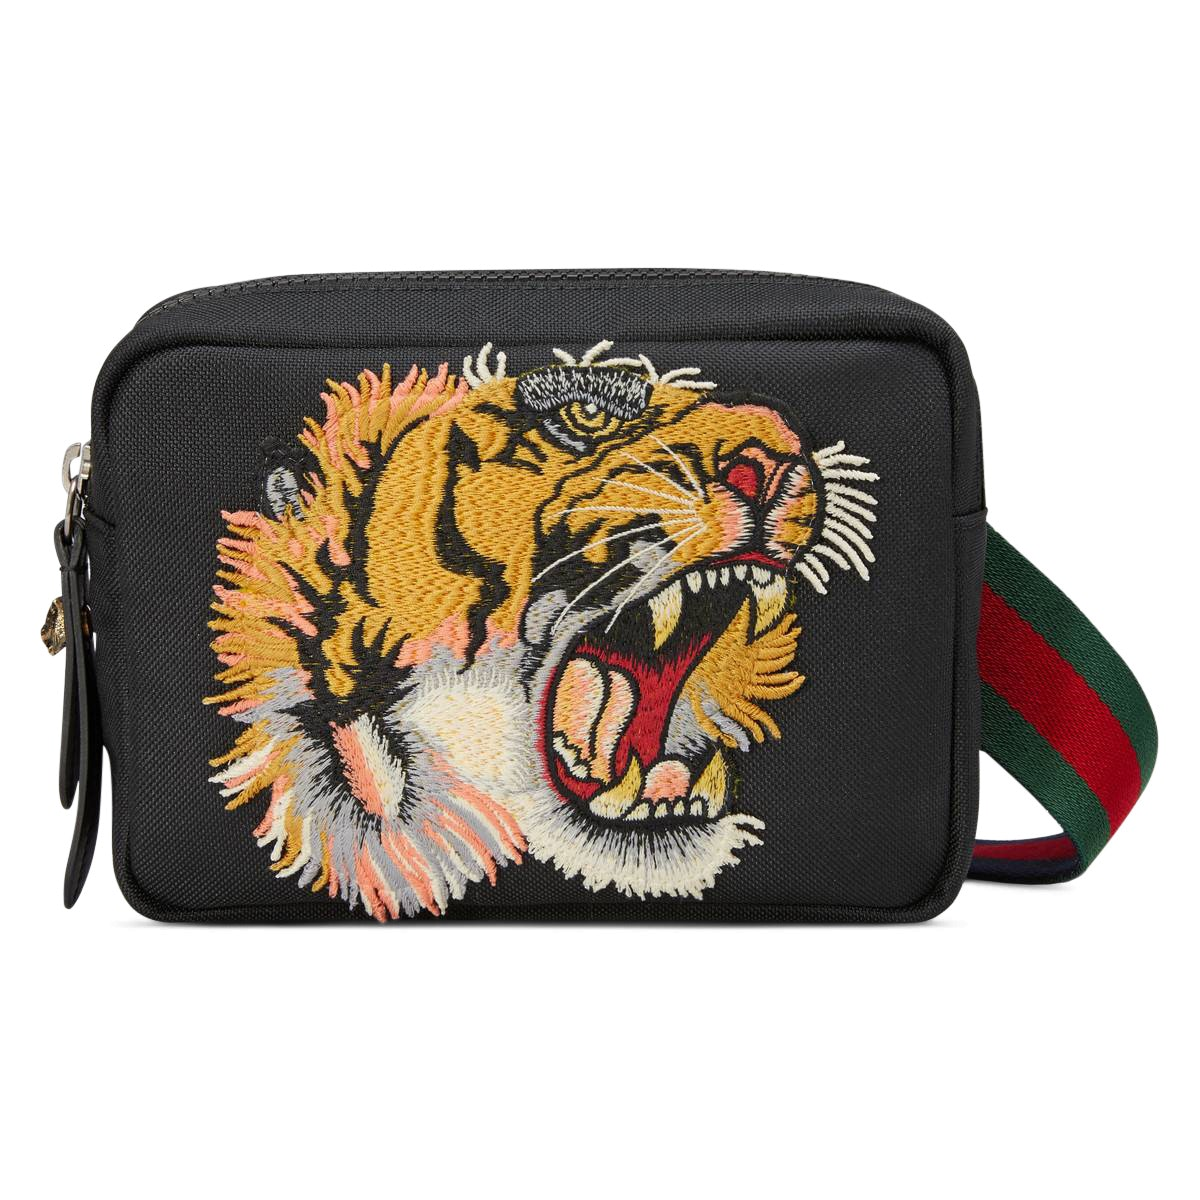 Gucci Shoulder Bag Panther Face Applique Black